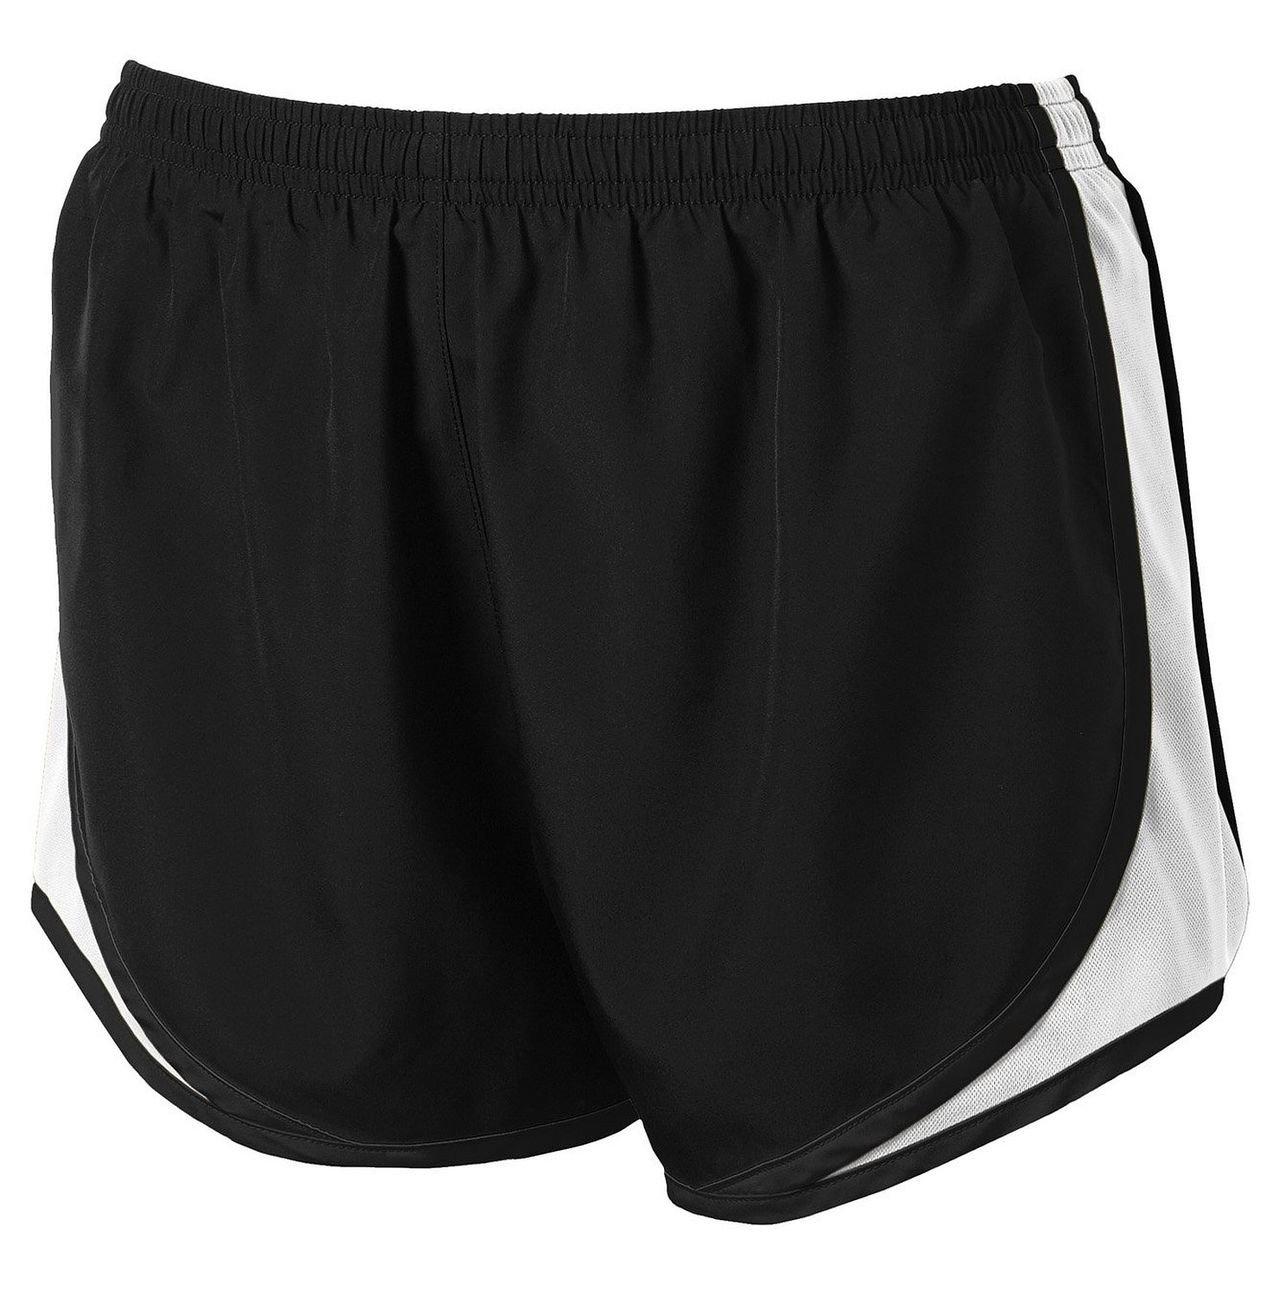 Clothe Co. Ladies Moisture Wicking Sport Running Shorts, Black/White/Black, XS